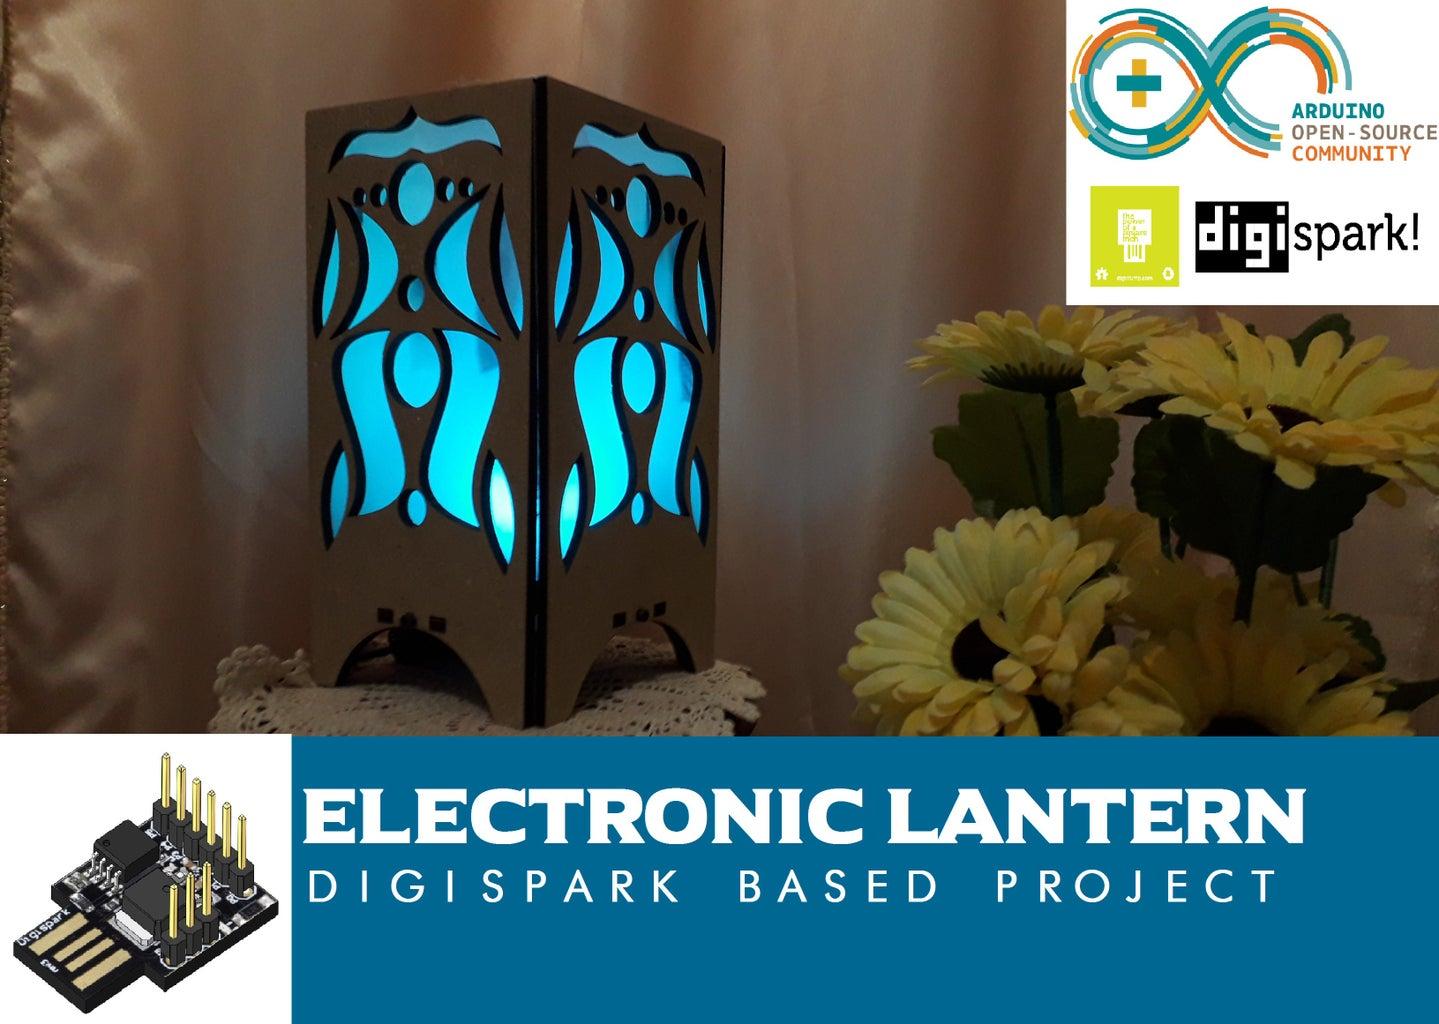 Digispark Lantern (ATtiny85 Project)